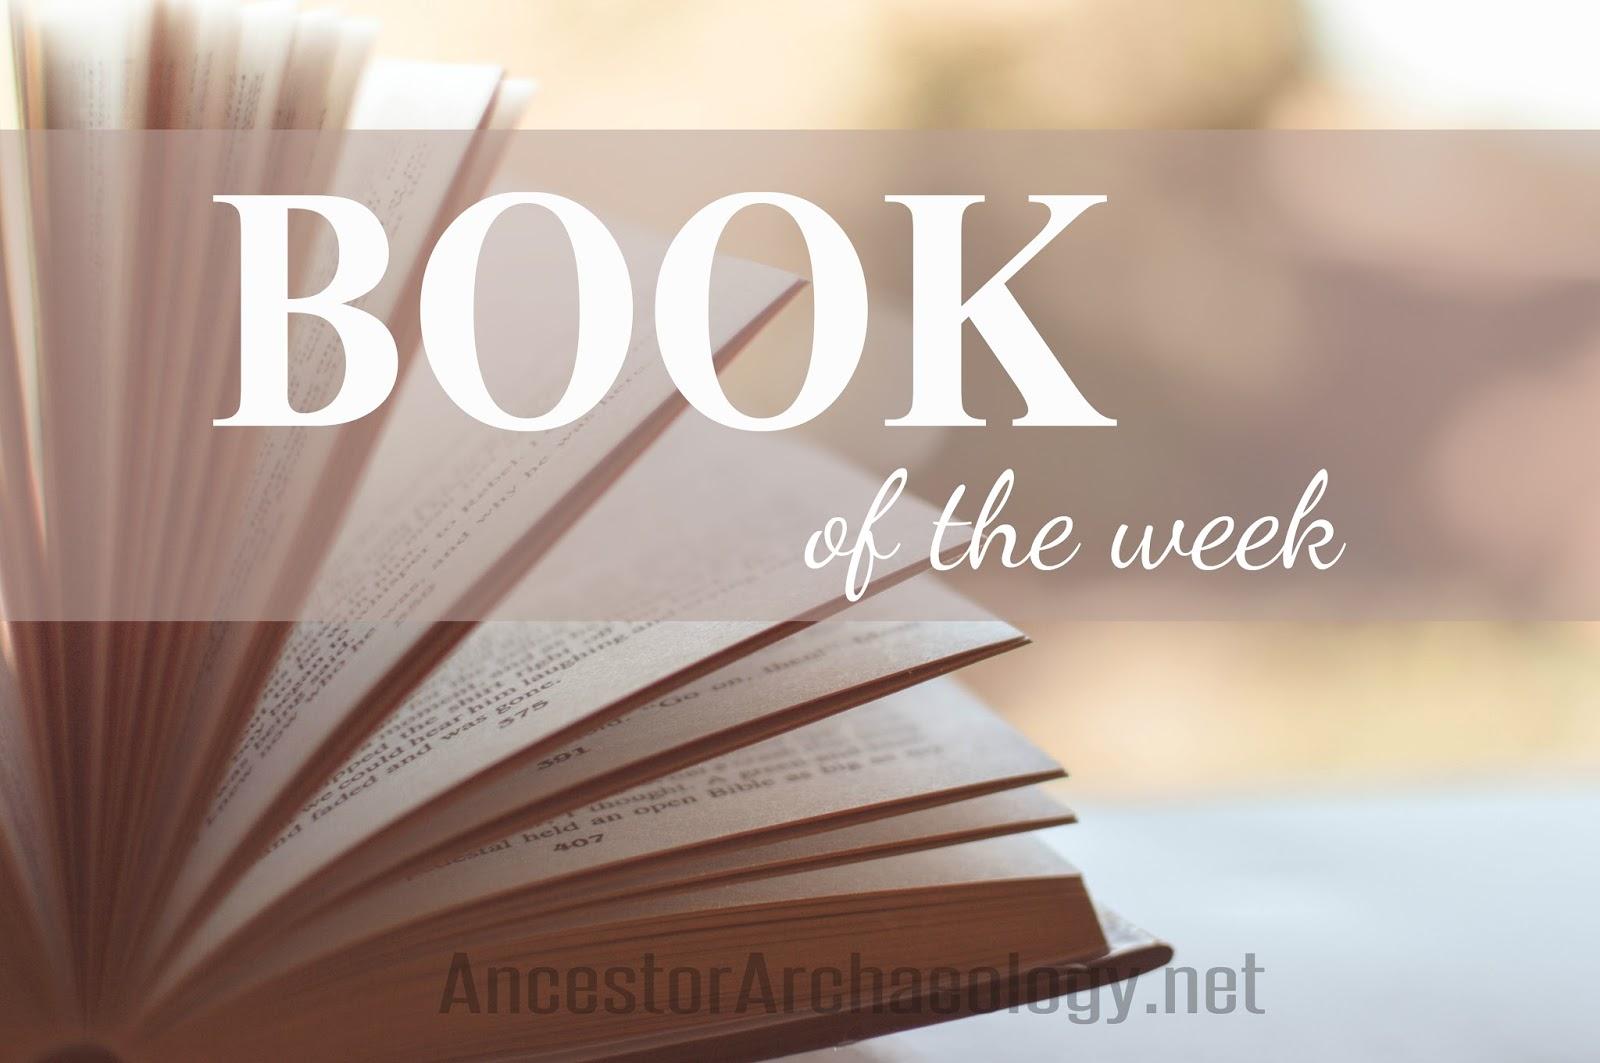 Ancestor Archaeology: September 2018